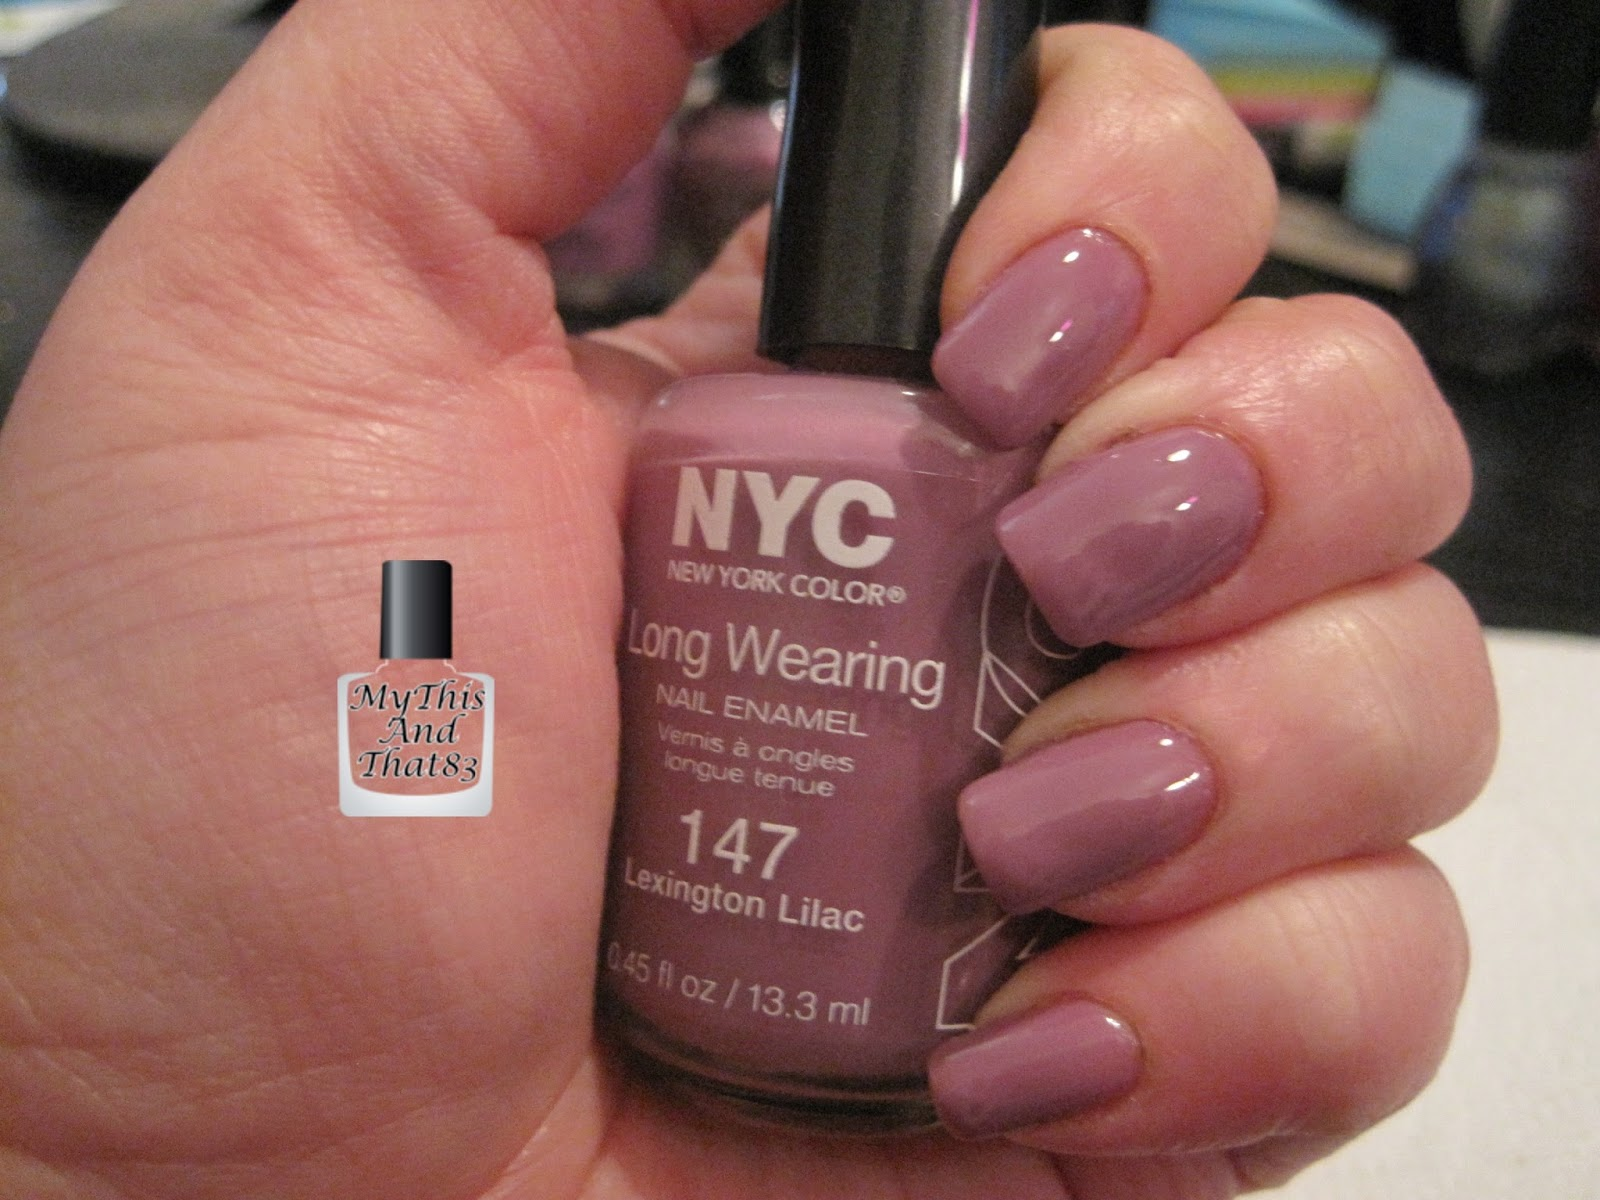 NYC nail polish Lexington Lilac